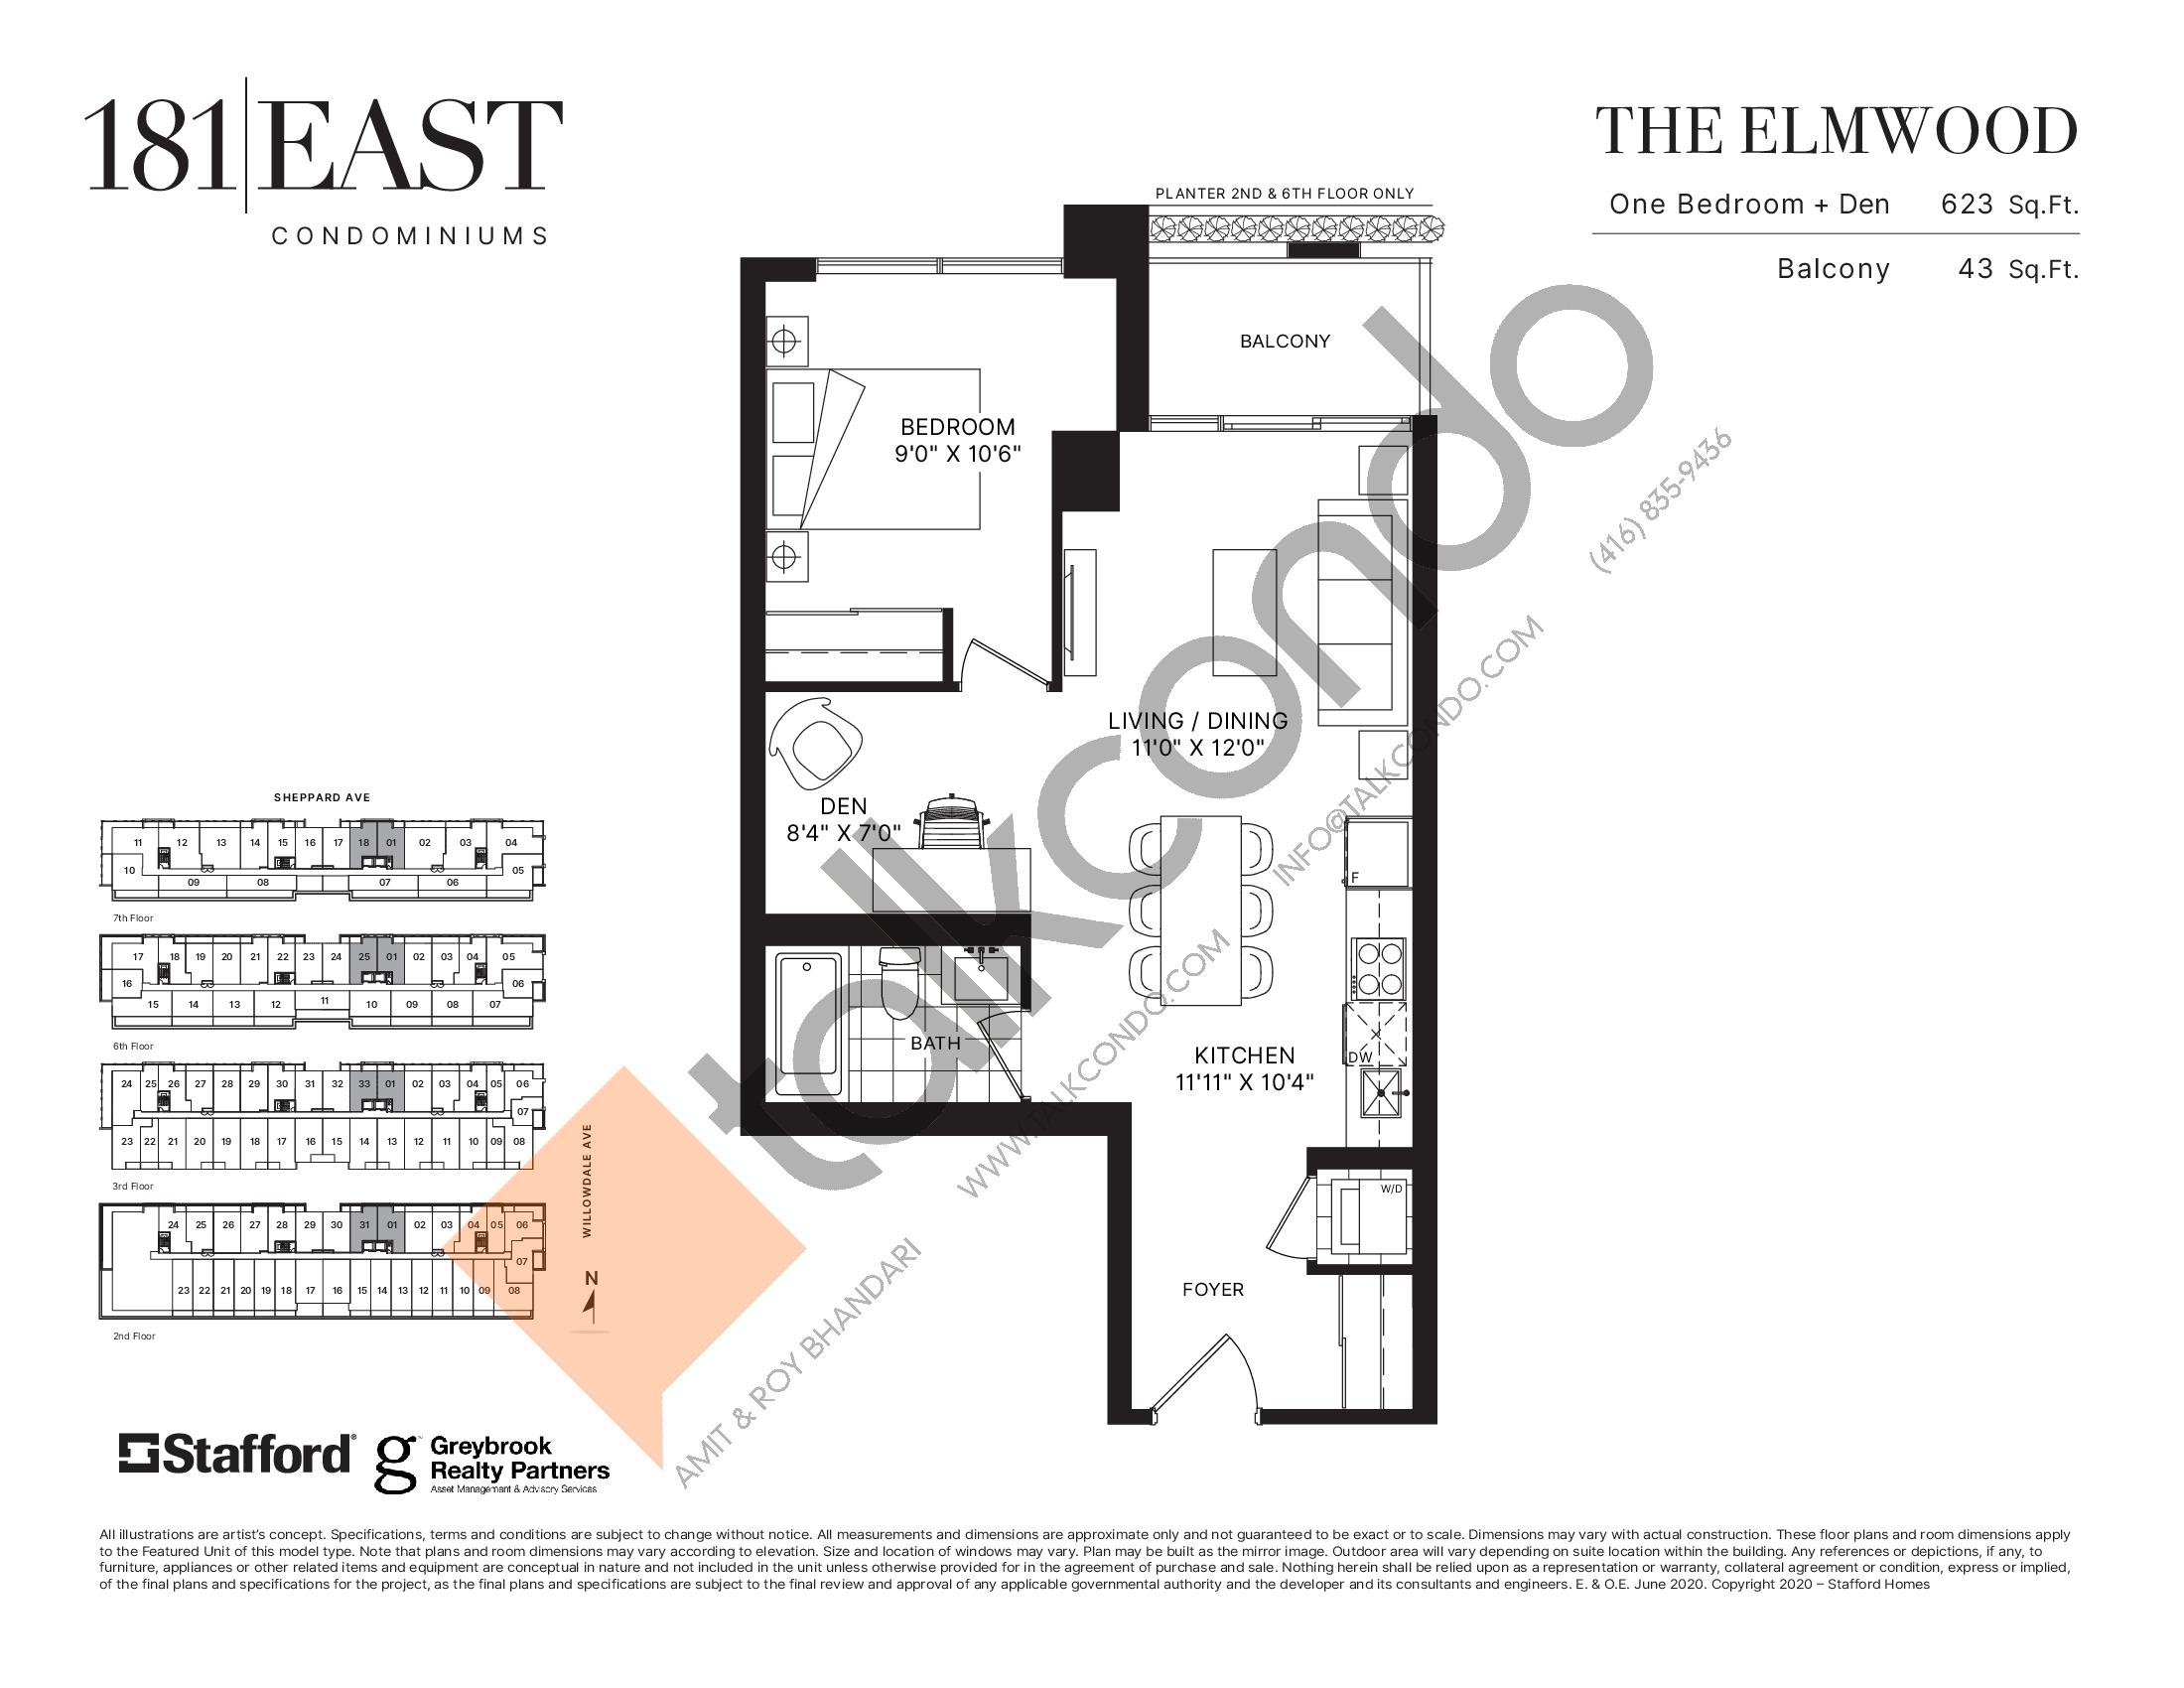 The Elmwood Floor Plan at 181 East Condos - 623 sq.ft